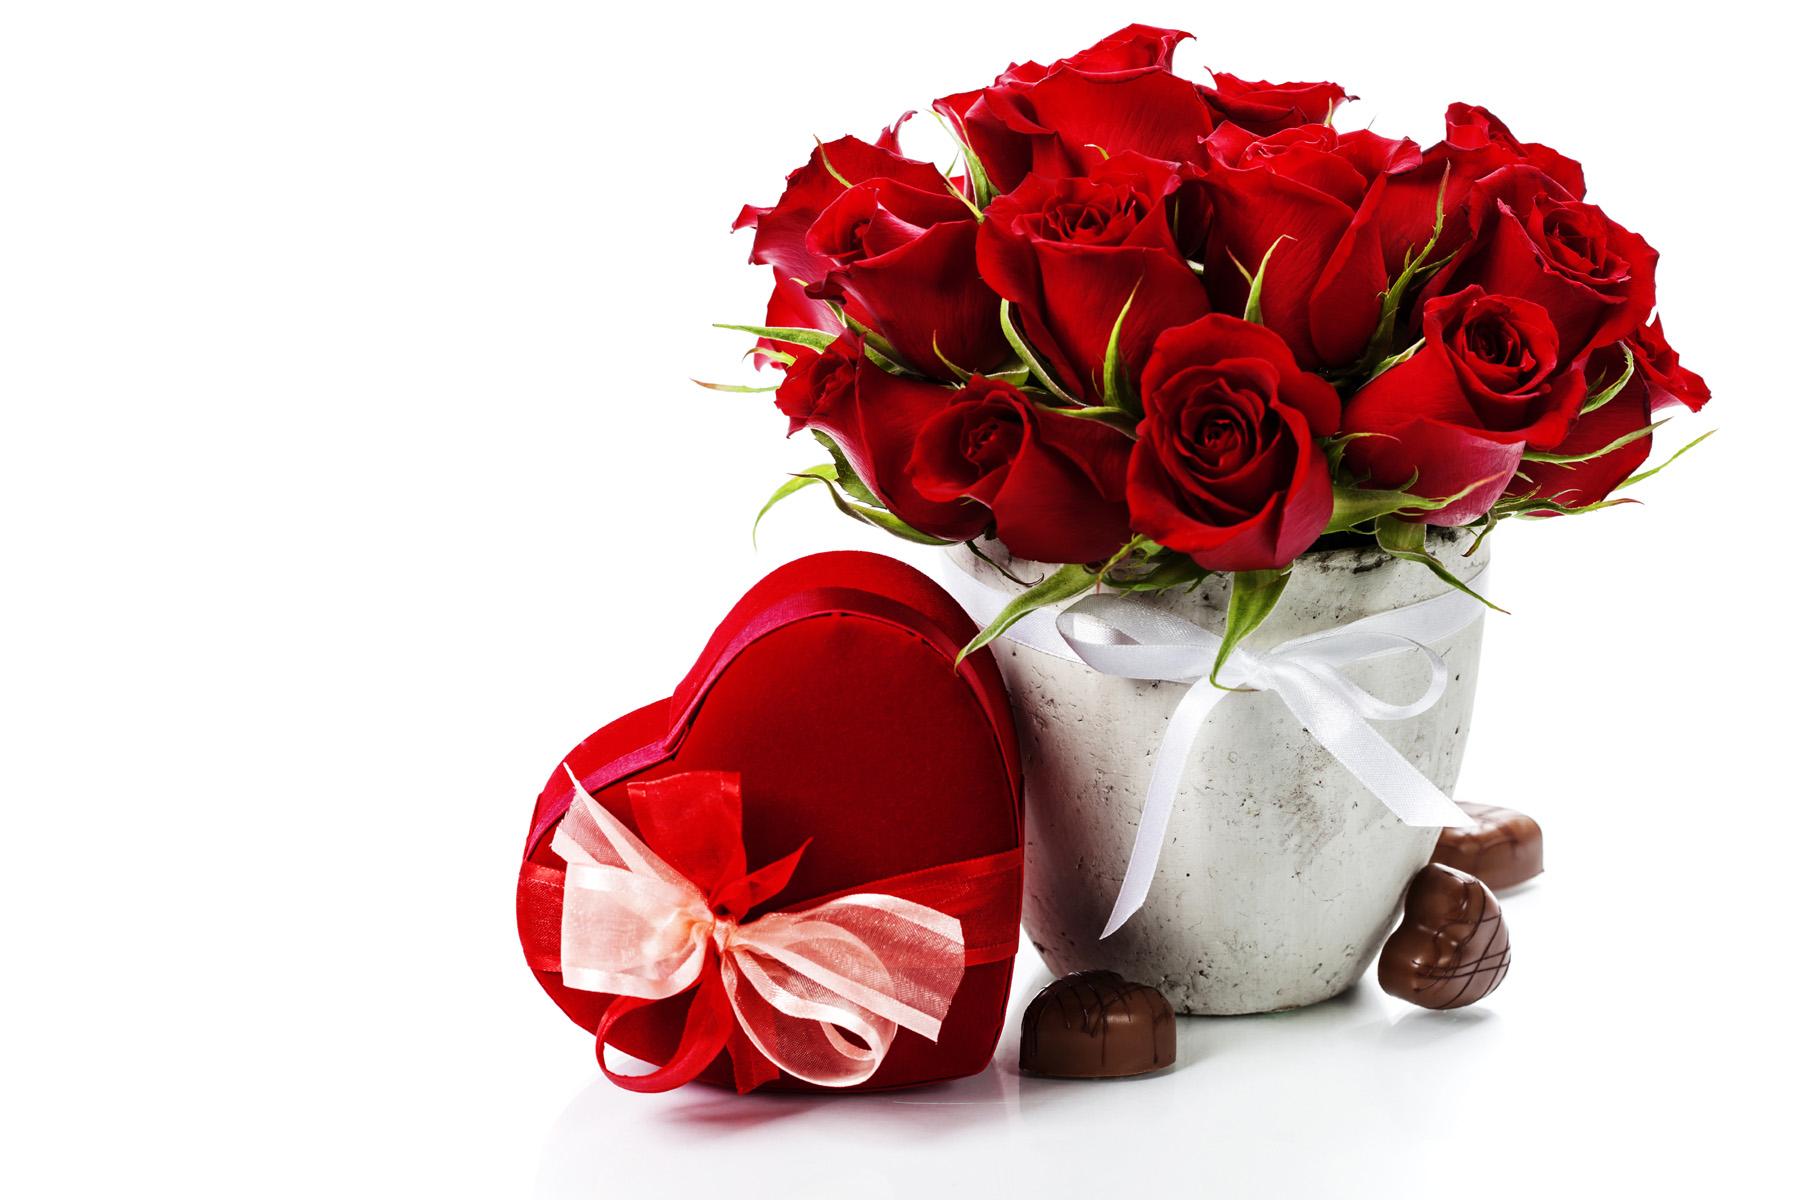 Red Rose Flower Pots Love Romantic Flower Gift 1800x1200 Wallpaper Teahub Io